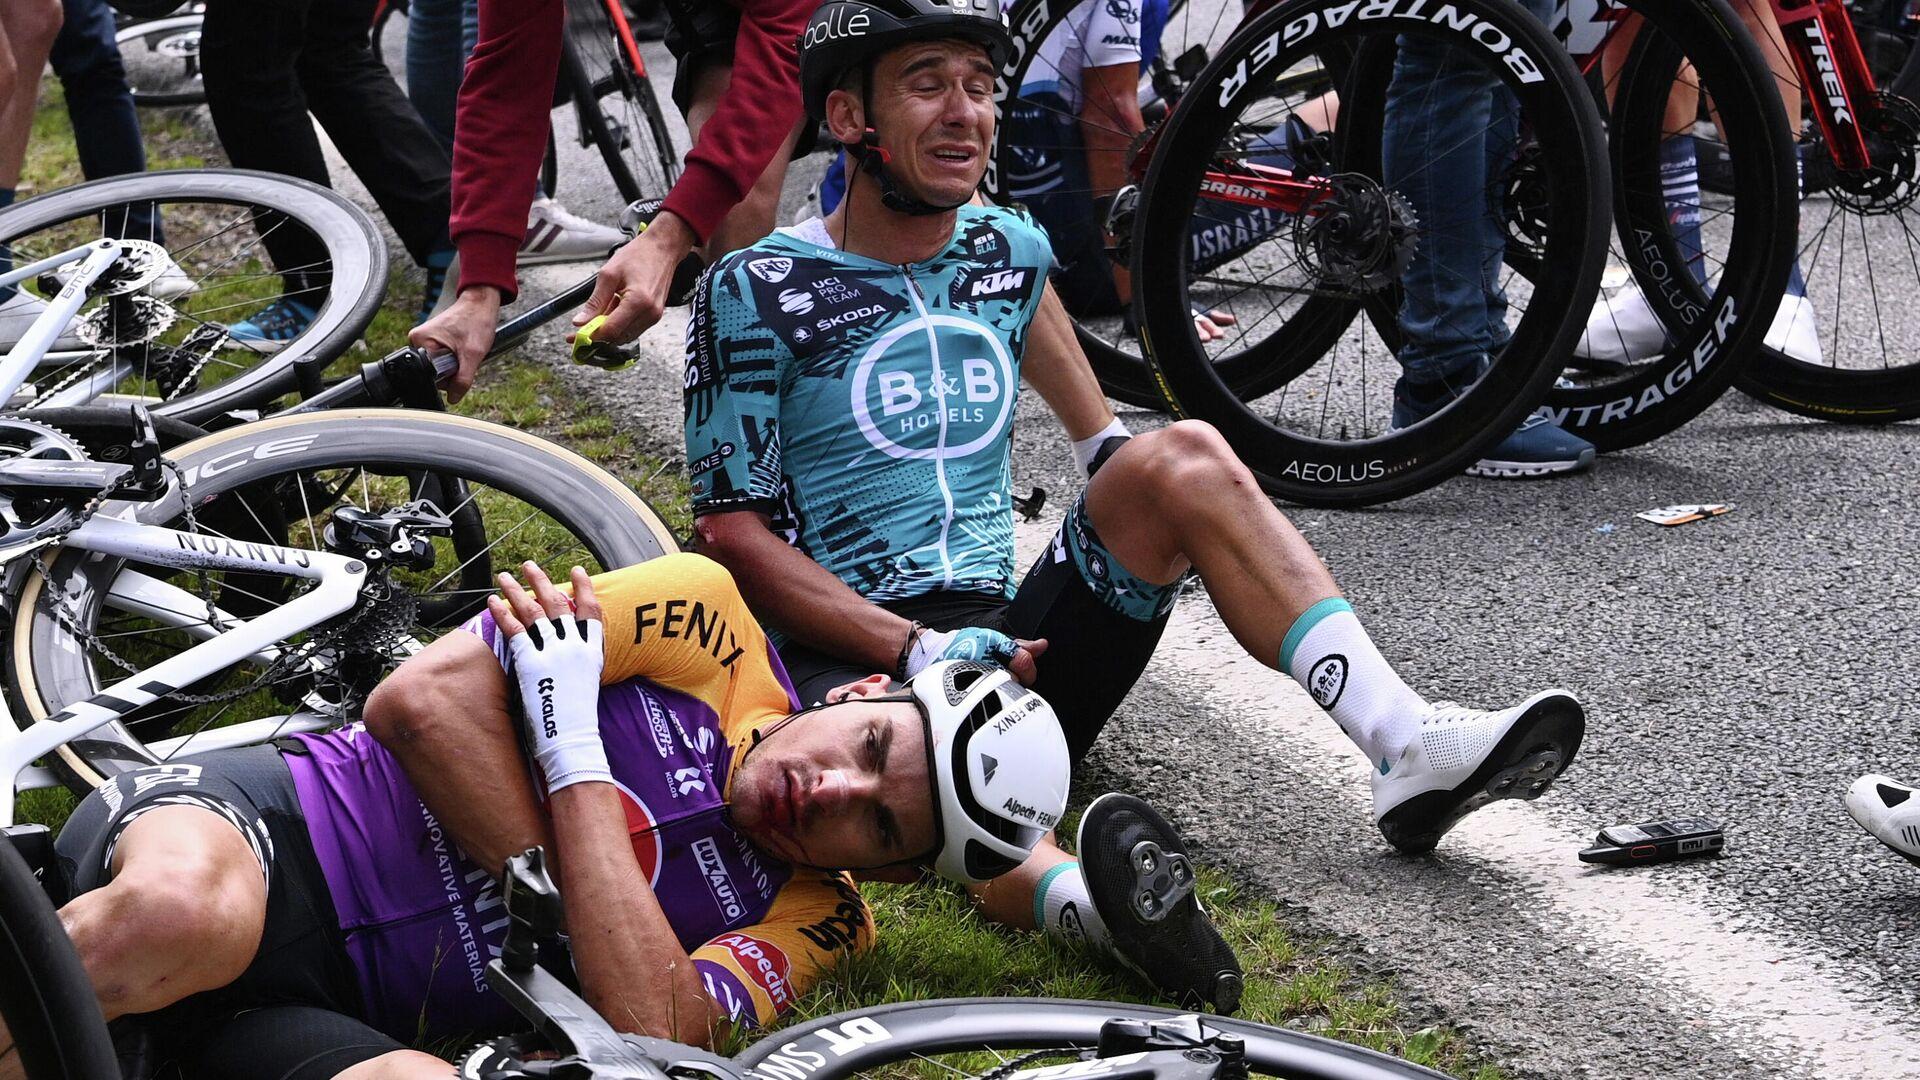 Accidente en el Tour de Francia - Sputnik Mundo, 1920, 01.07.2021